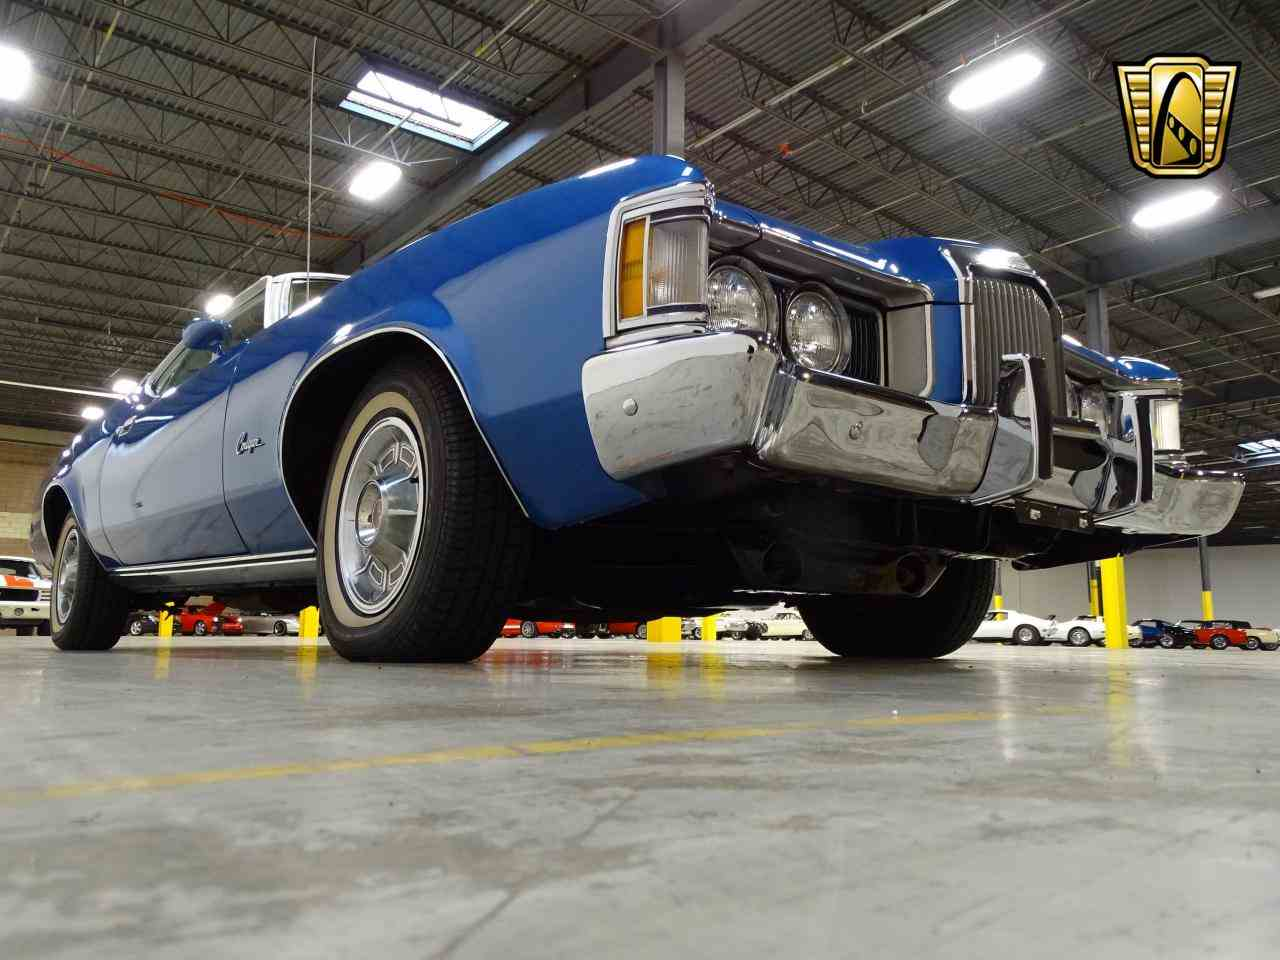 1973 mercury cougar for sale cc 970949 for Deptford motor vehicle inspection